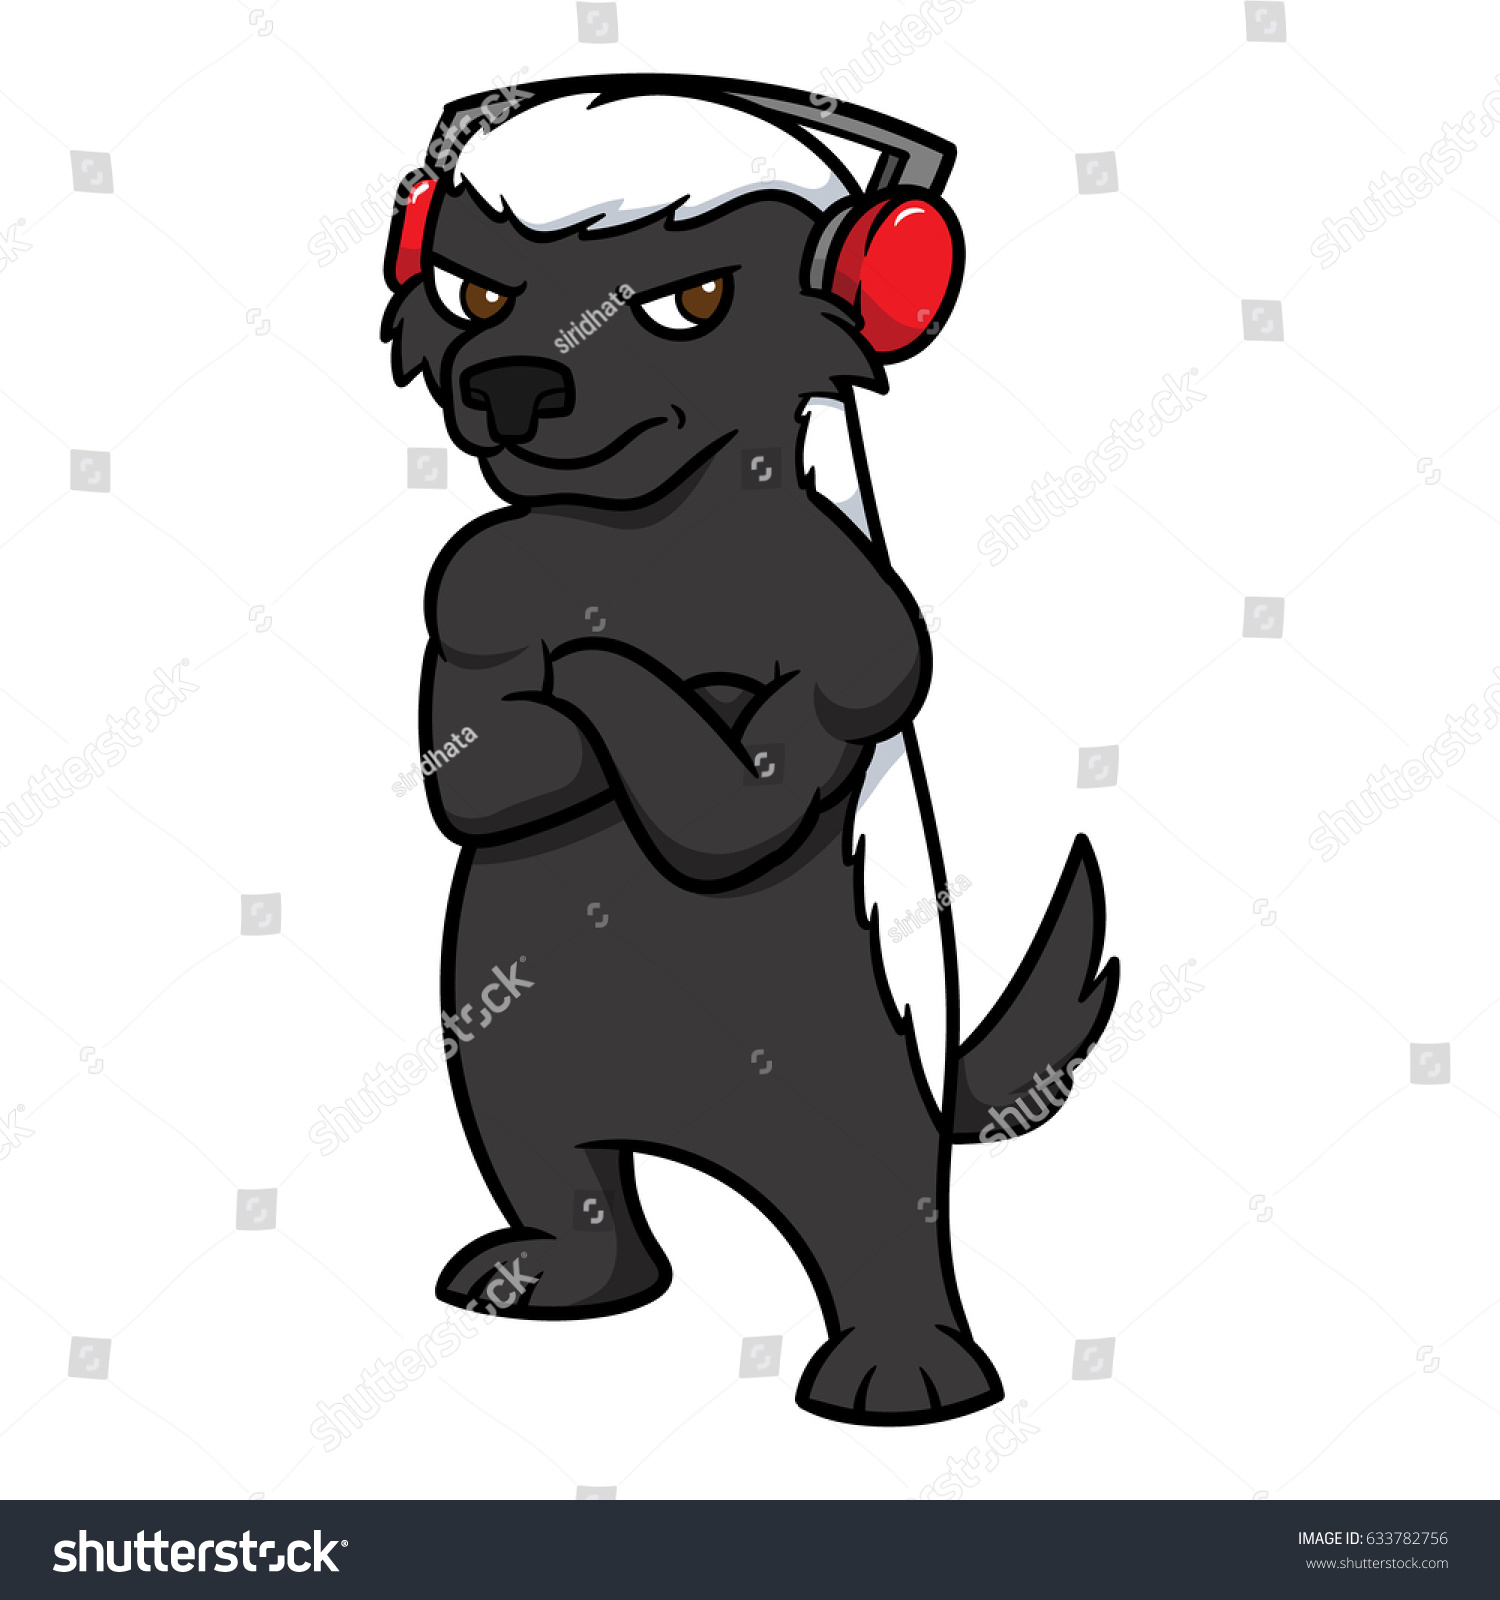 Cartoon Honey Badger Wearing Headphones Vector Stock ...  Cartoon Honey B...